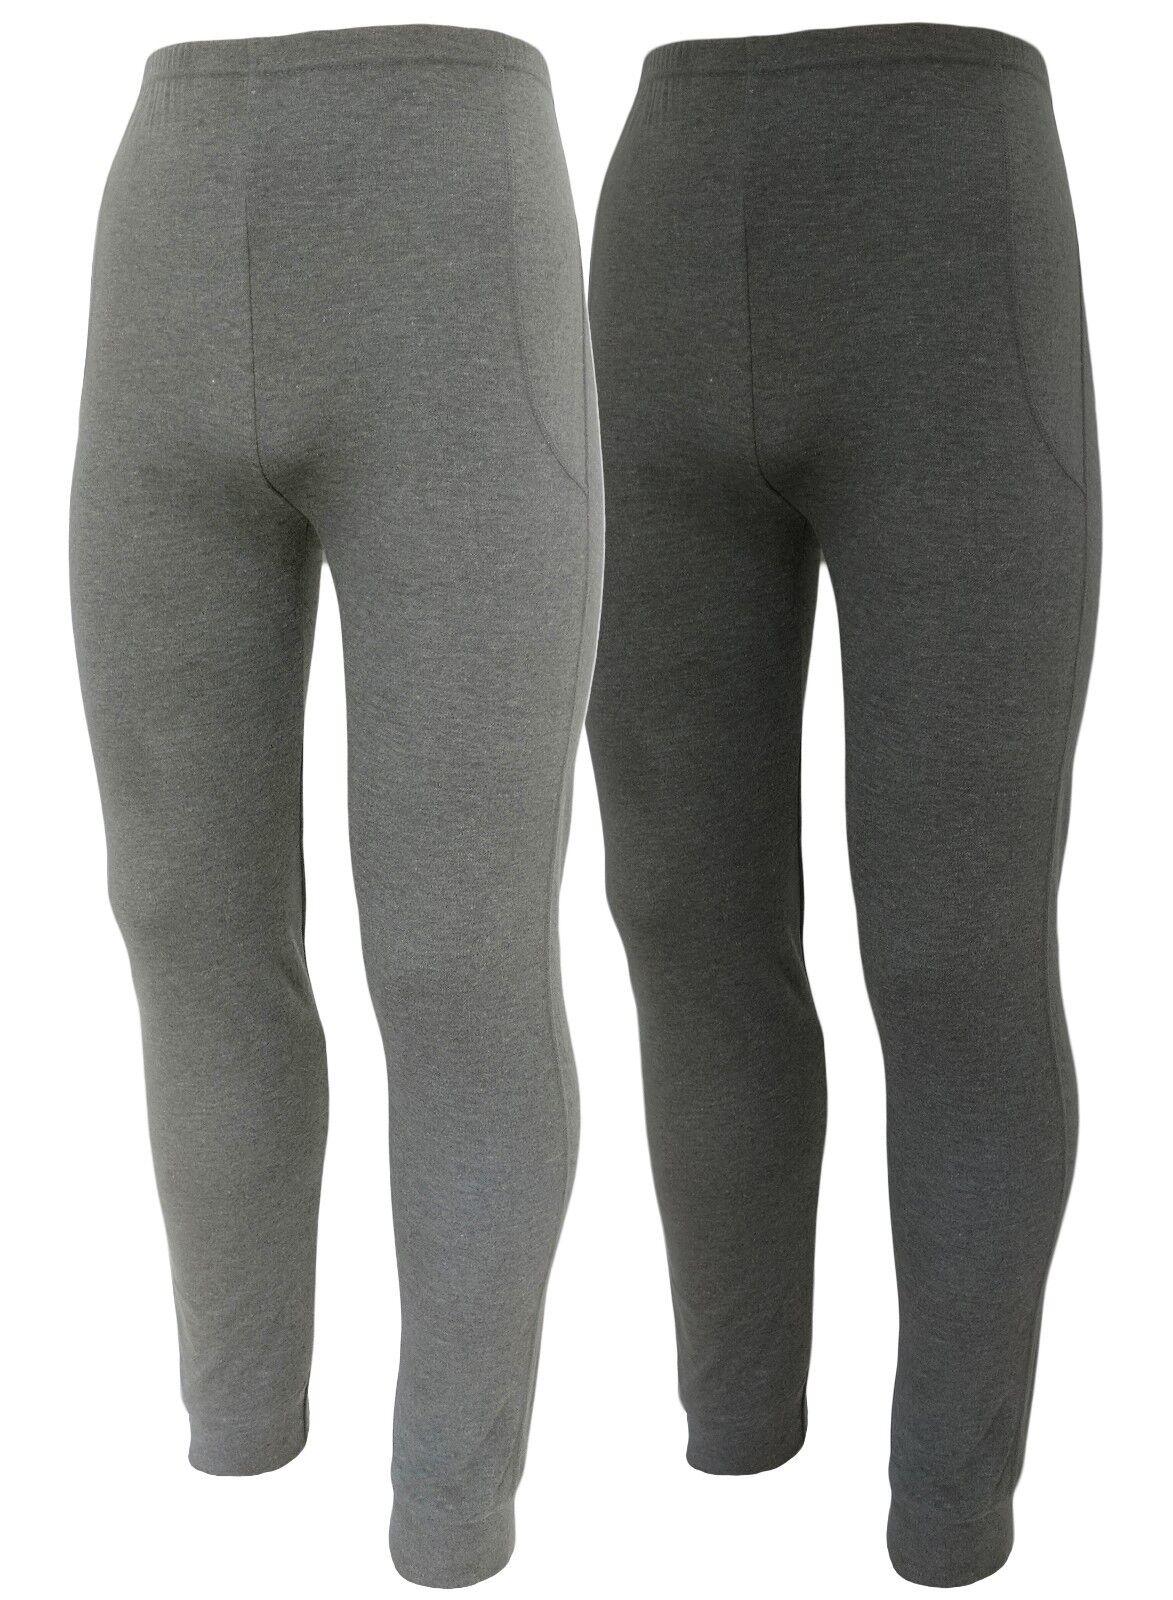 Lange Unterhose Männer Leggings 2x Herren Sport Funktions Leggings Arbeitswäsche